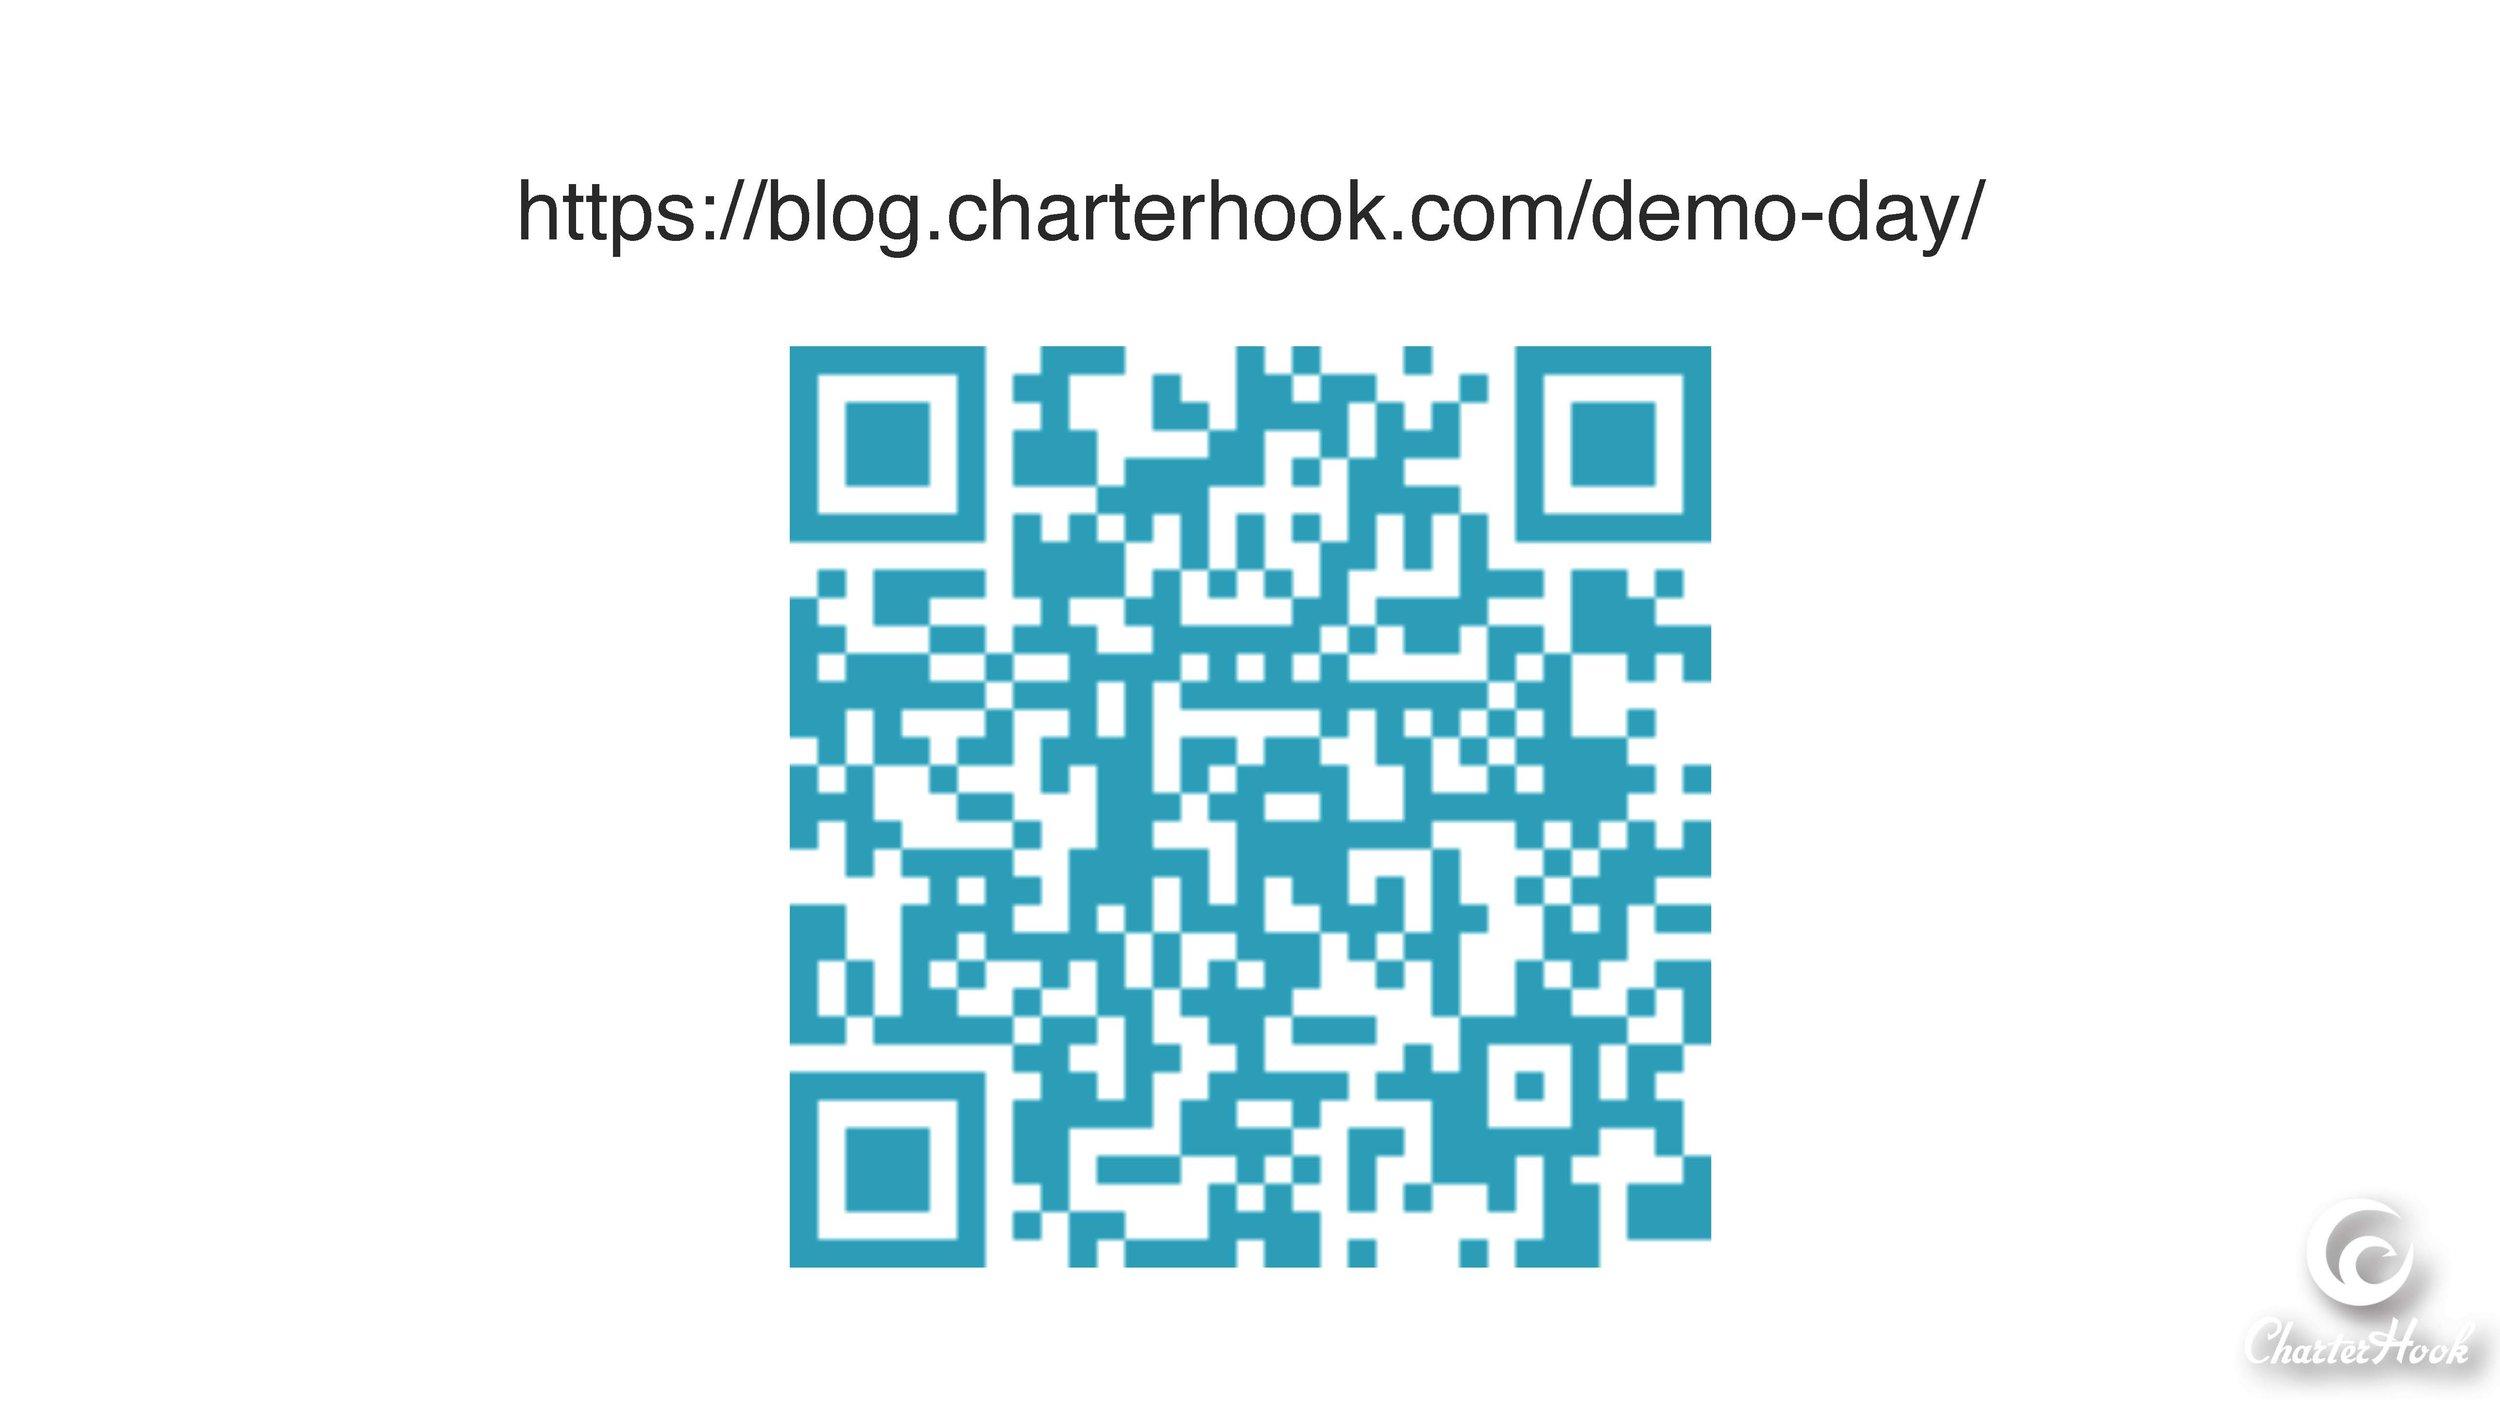 Charterhook_Demo Day Pitch Deck_08162018_Page_12.jpg